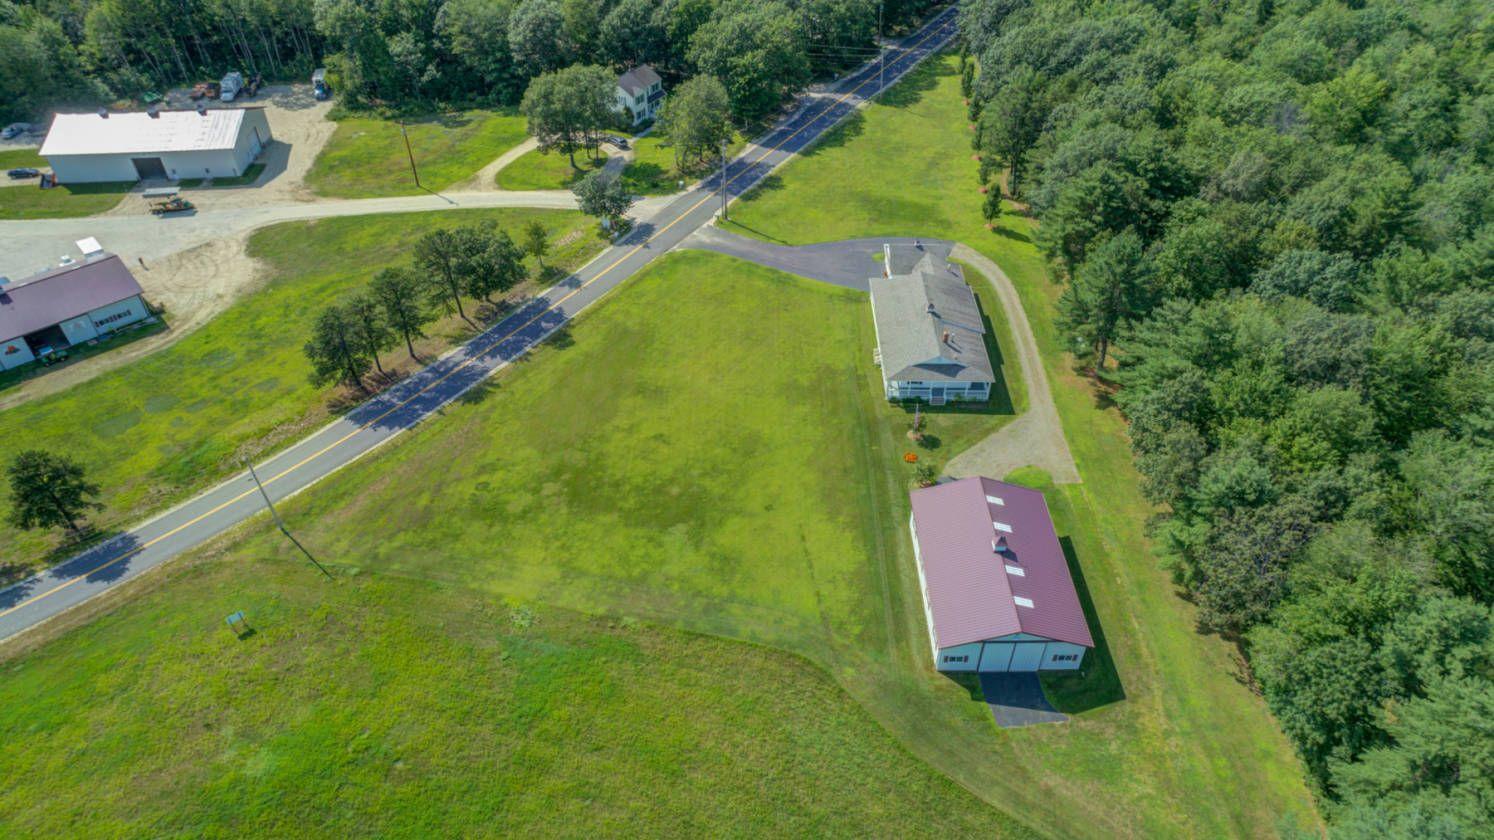 Equestrian estate for sale in cumberland county maine